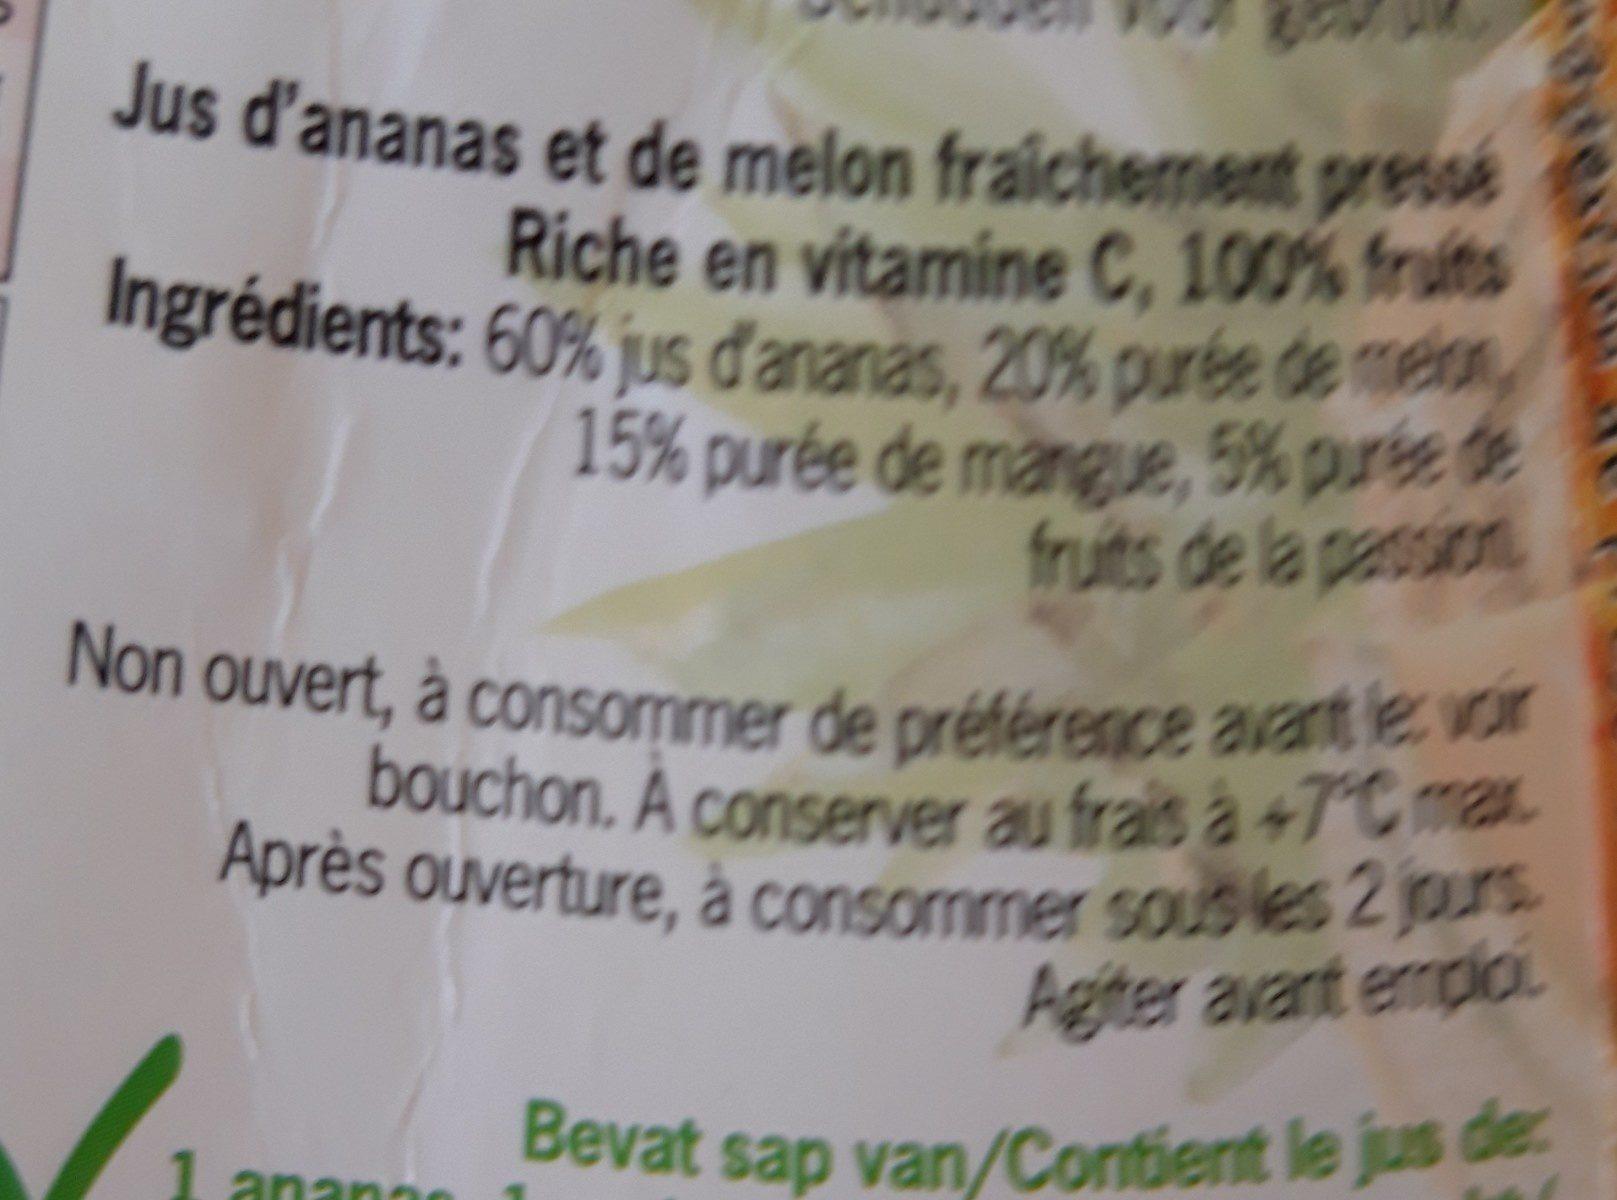 Ananas Meloen Flesje 500 ML (chef Select) Koeling - Ingrédients